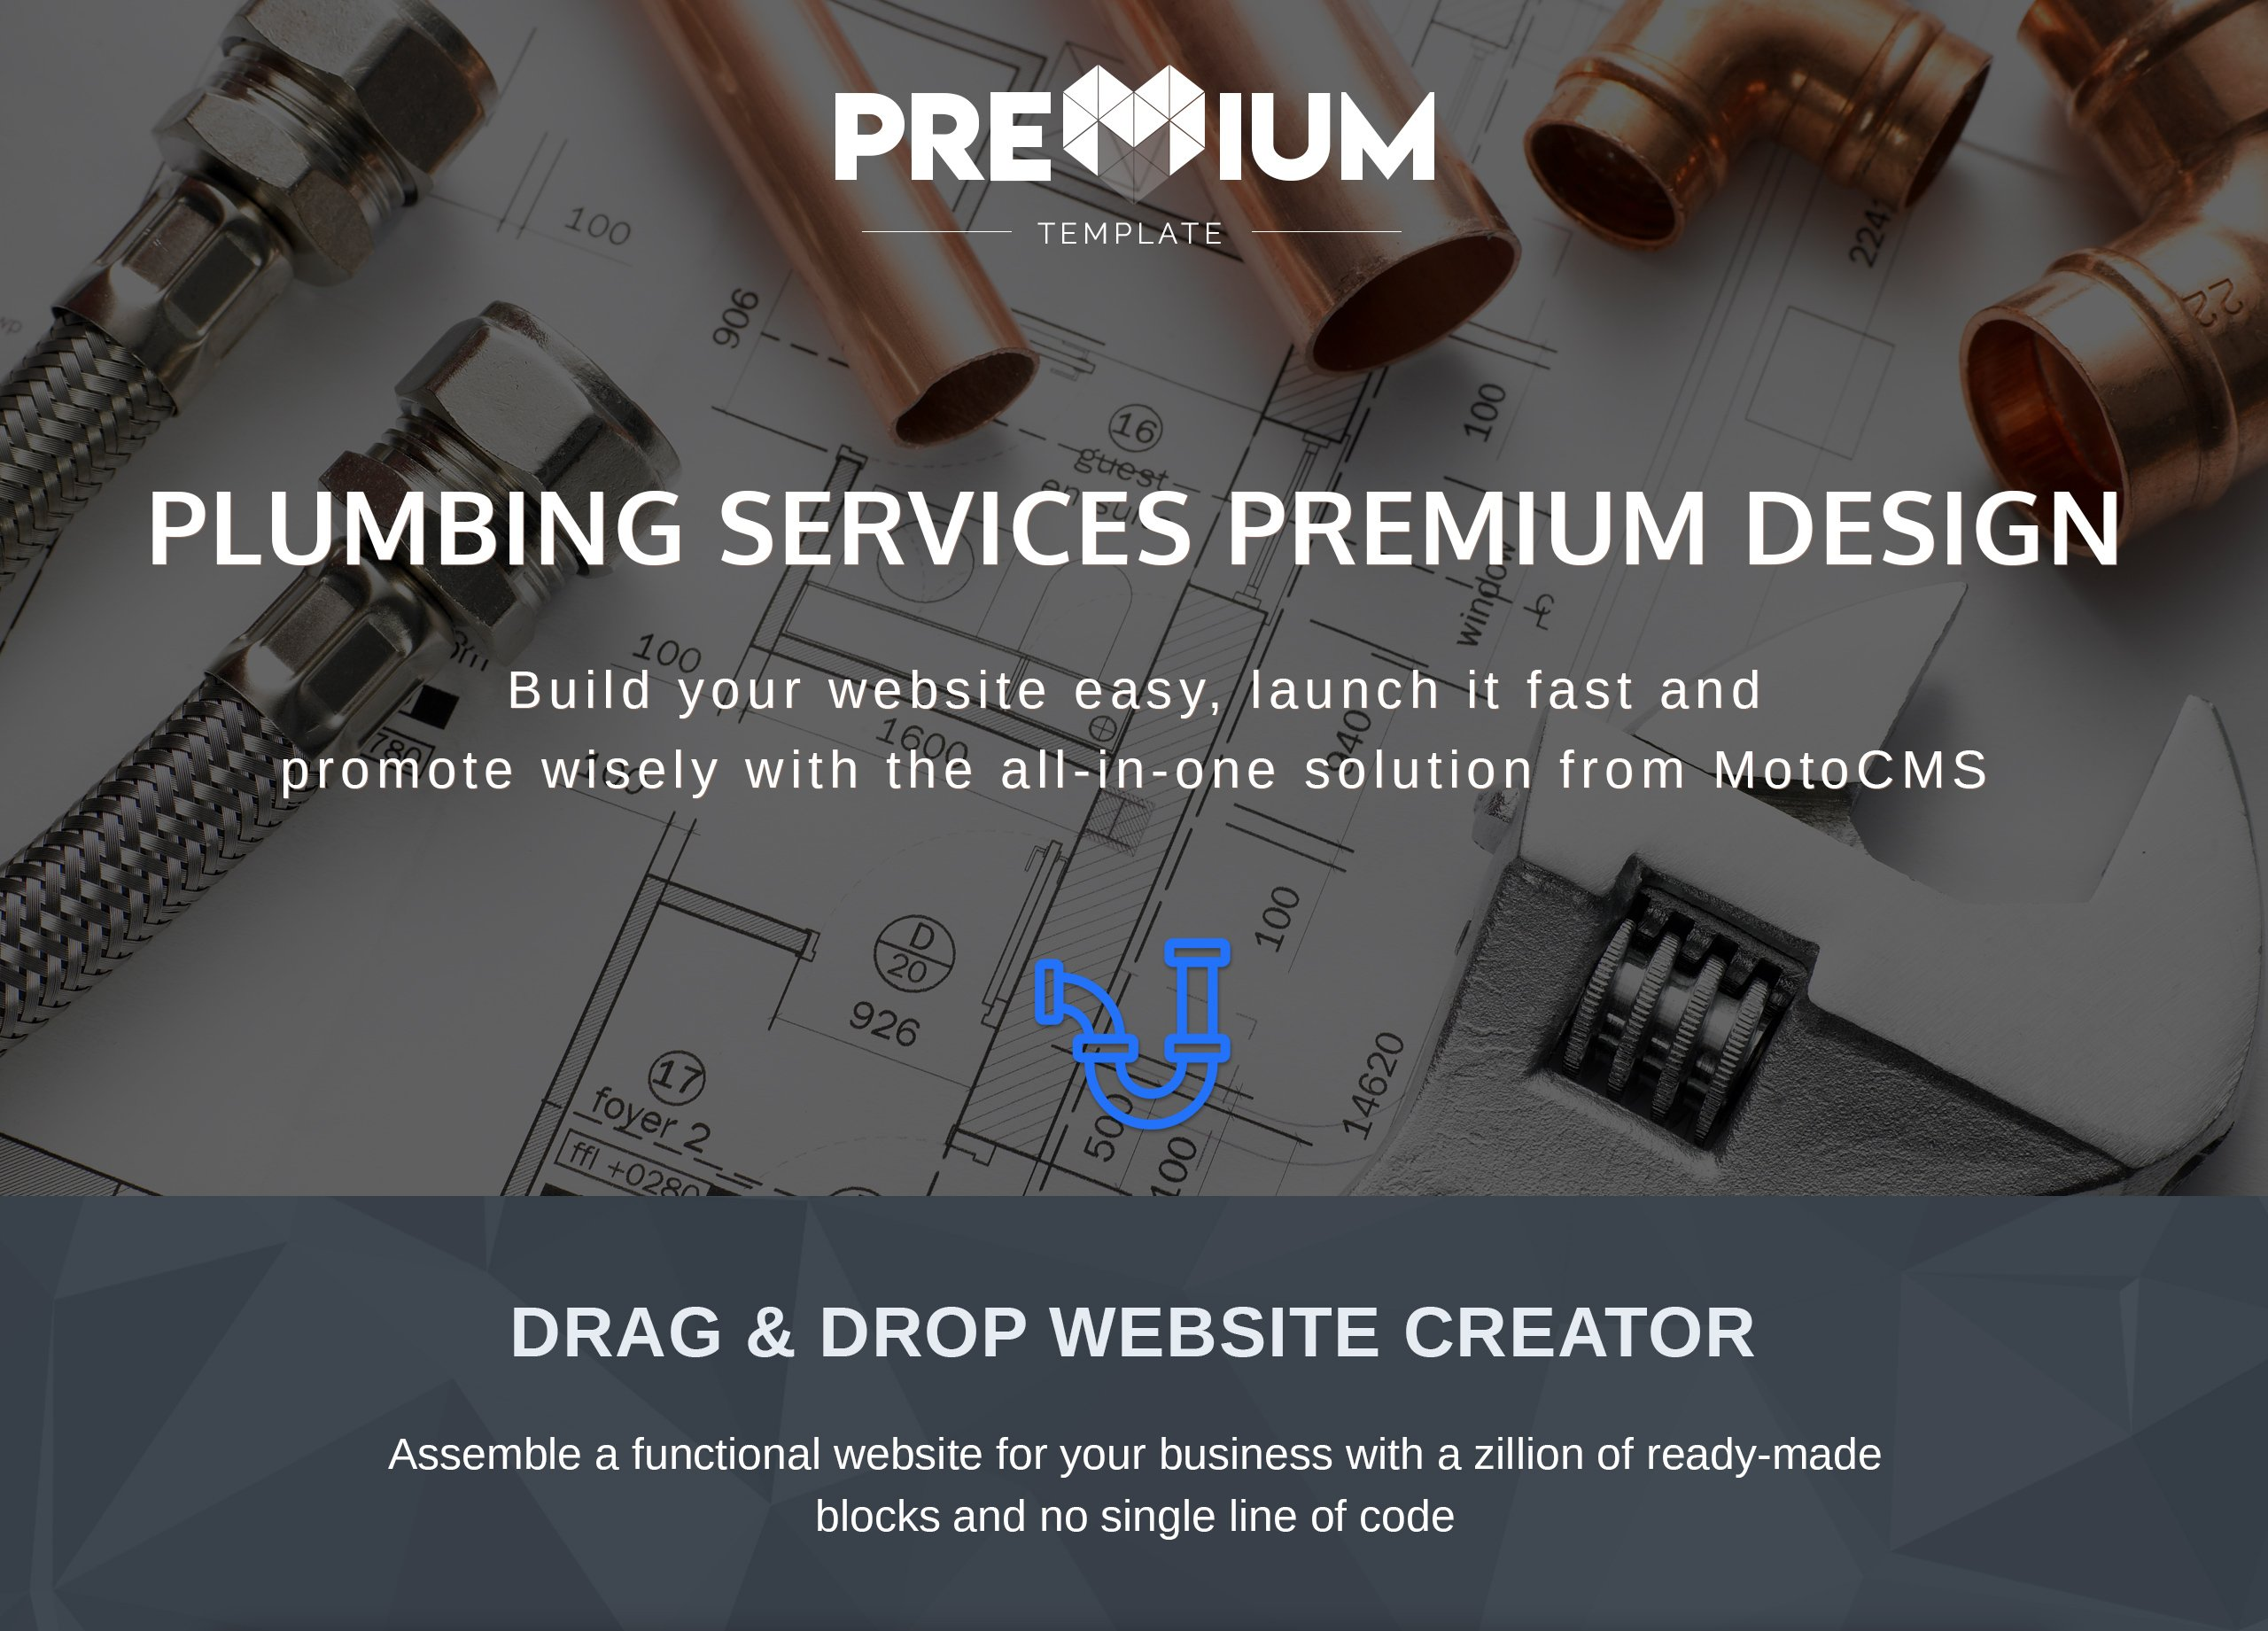 Plumberwo - Premium Moto CMS 3 Template